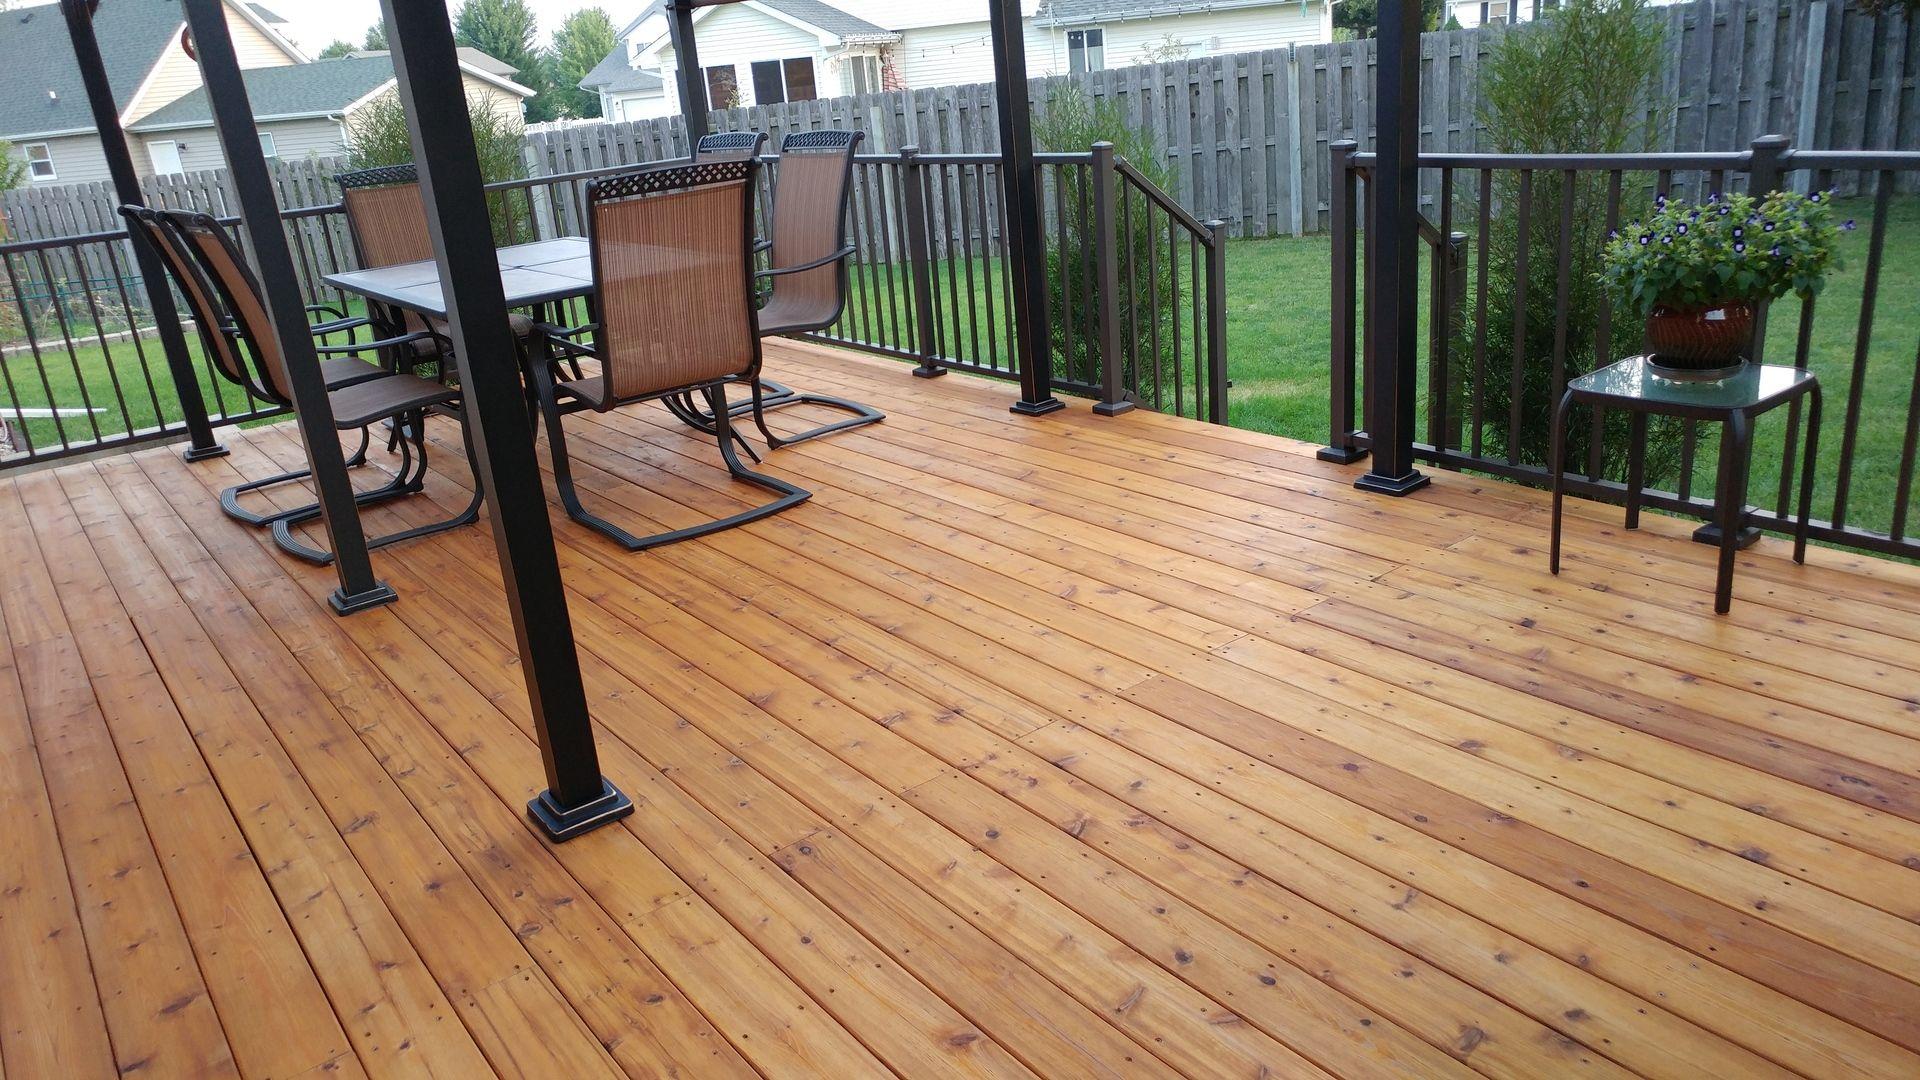 Cedar Oil Penofin Gallon Deck Stain And Deck Sealer Cedar Oil within sizing 1920 X 1080